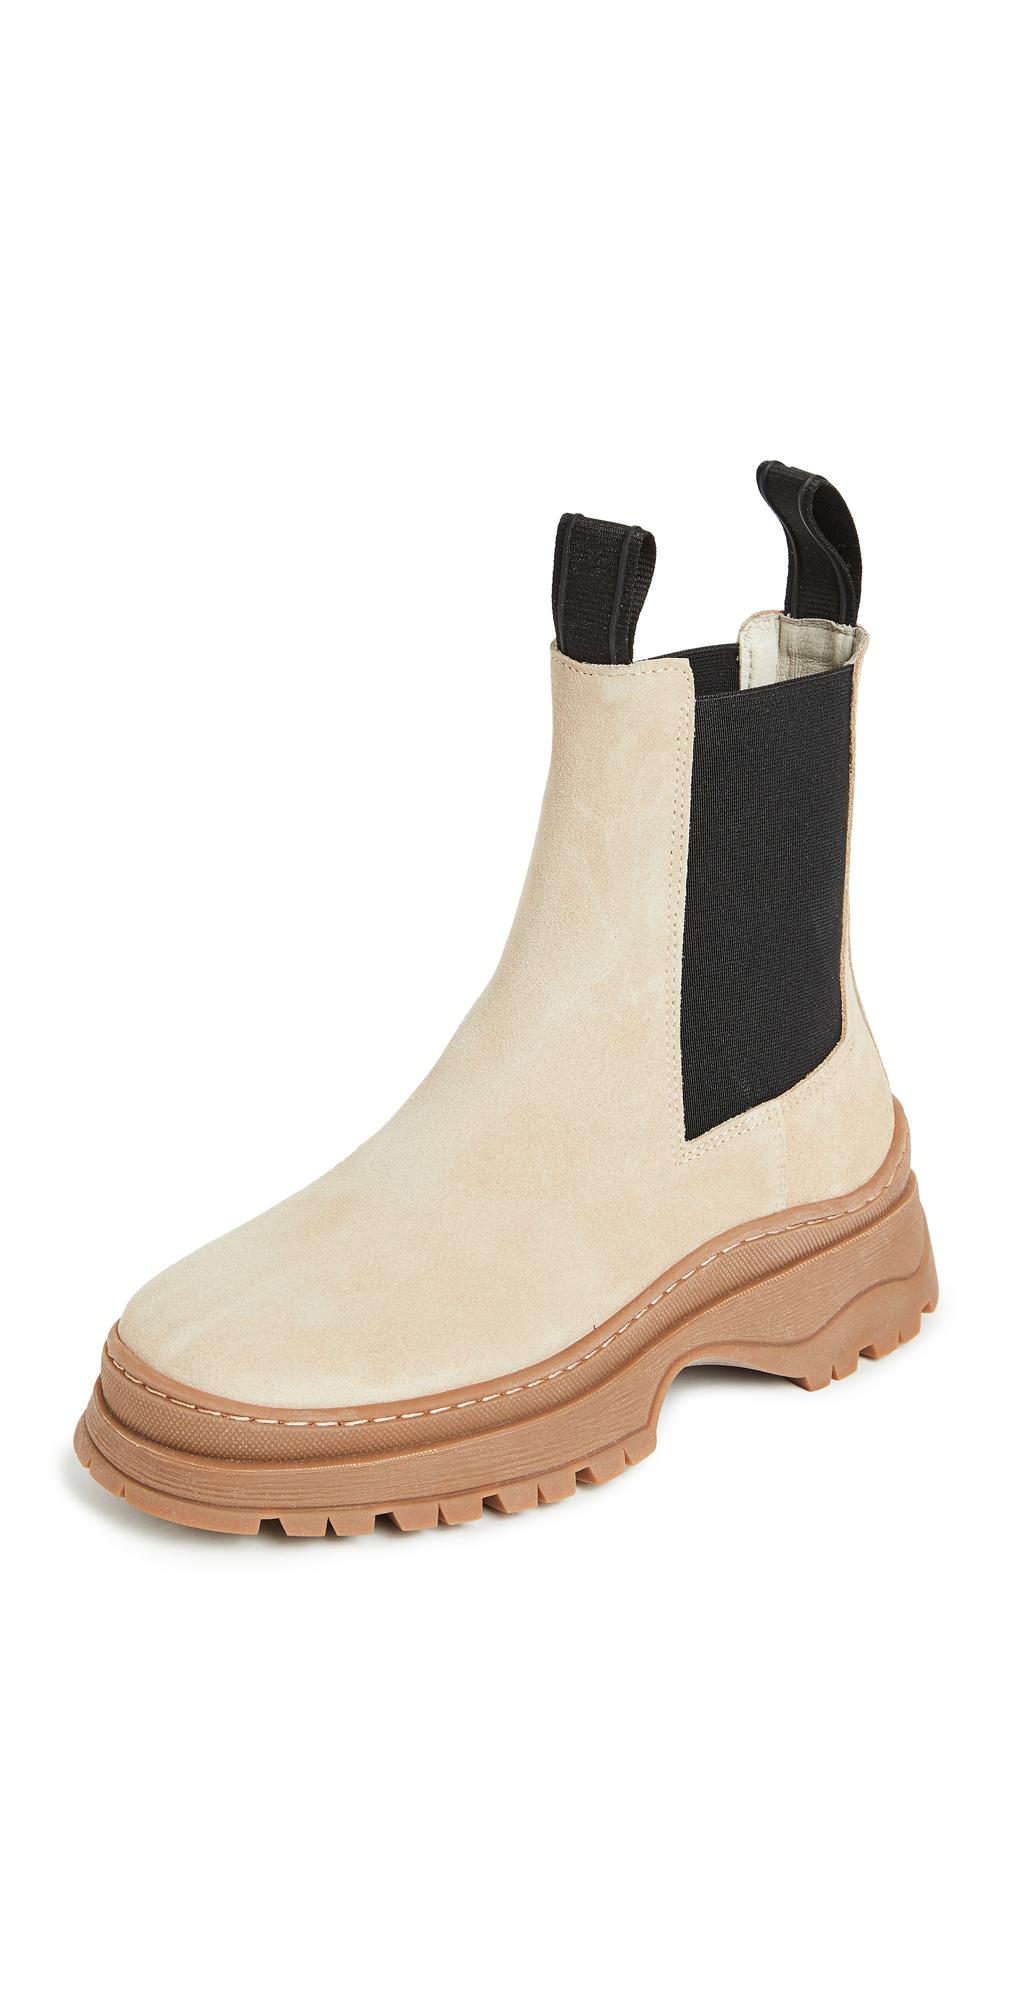 Powder Chelsea Boots